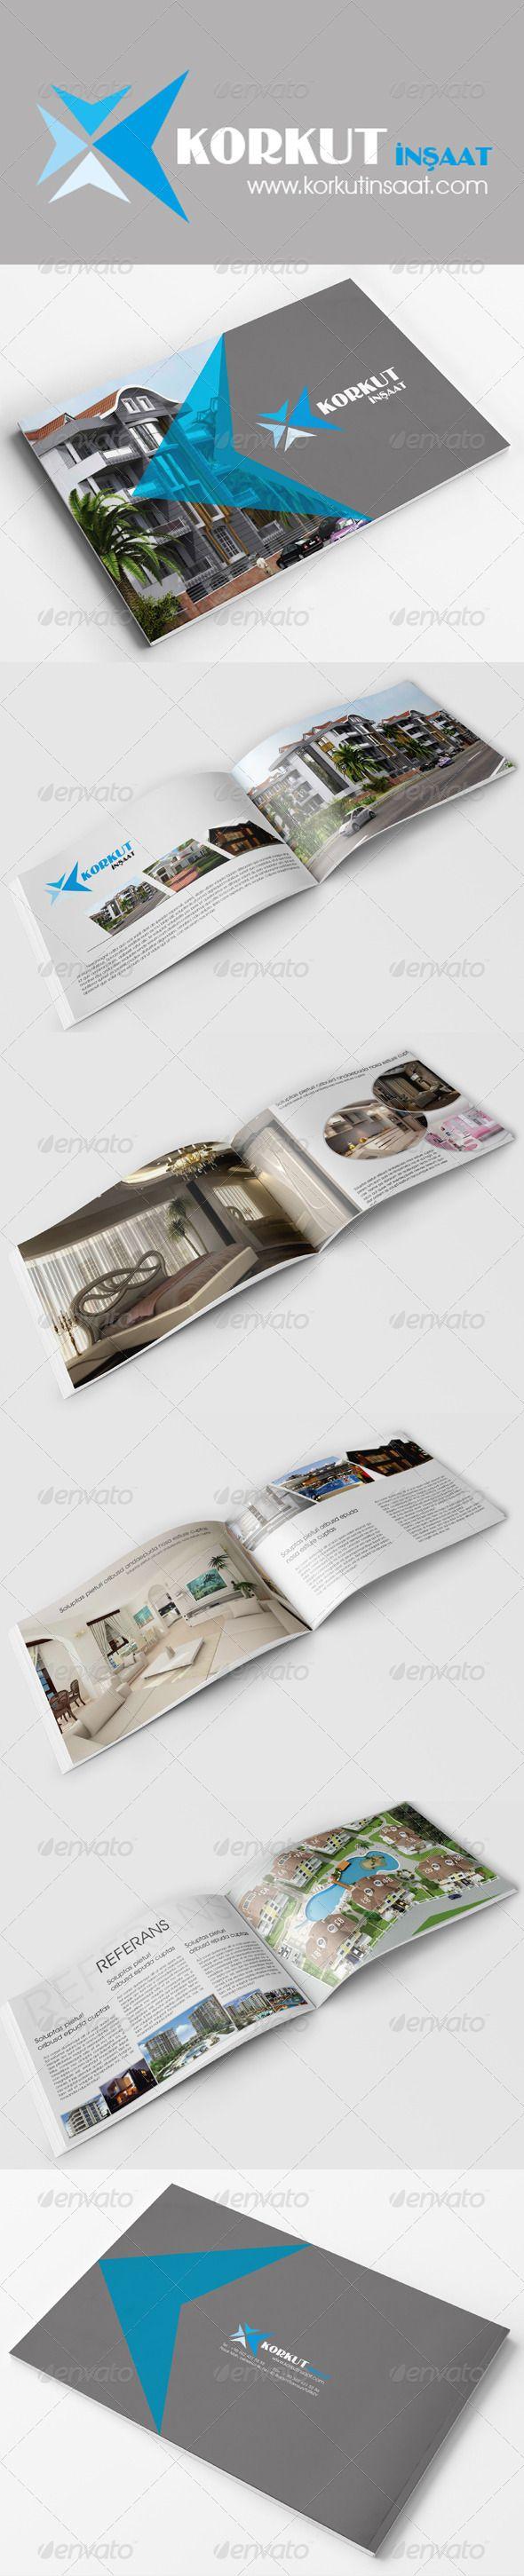 Korkut Construction Brochure